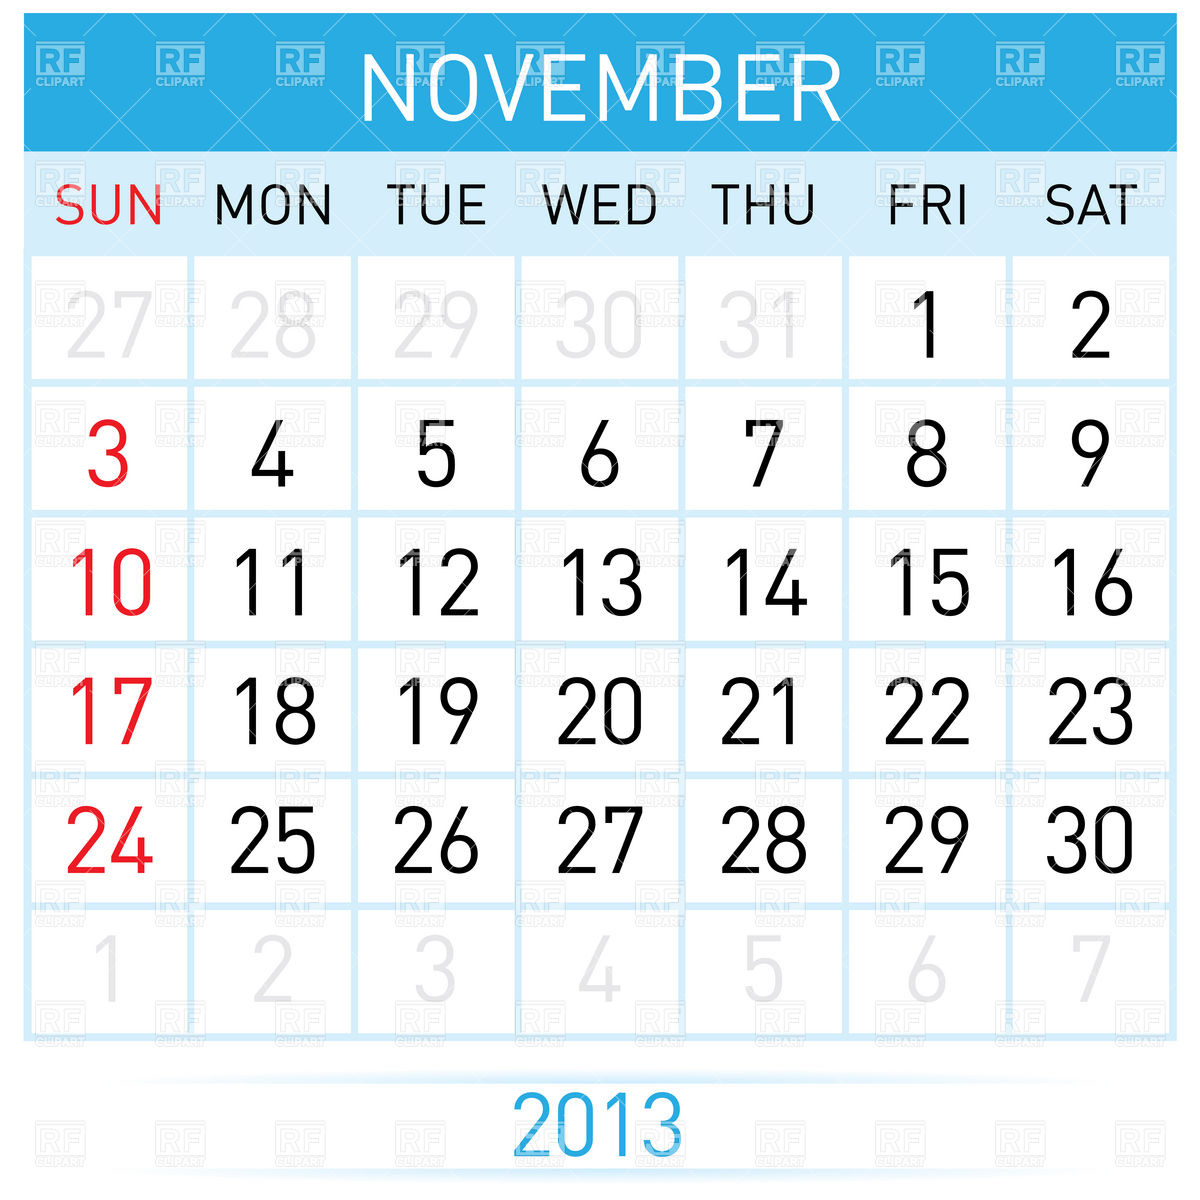 Kid month download royalty. Clipart calendar november